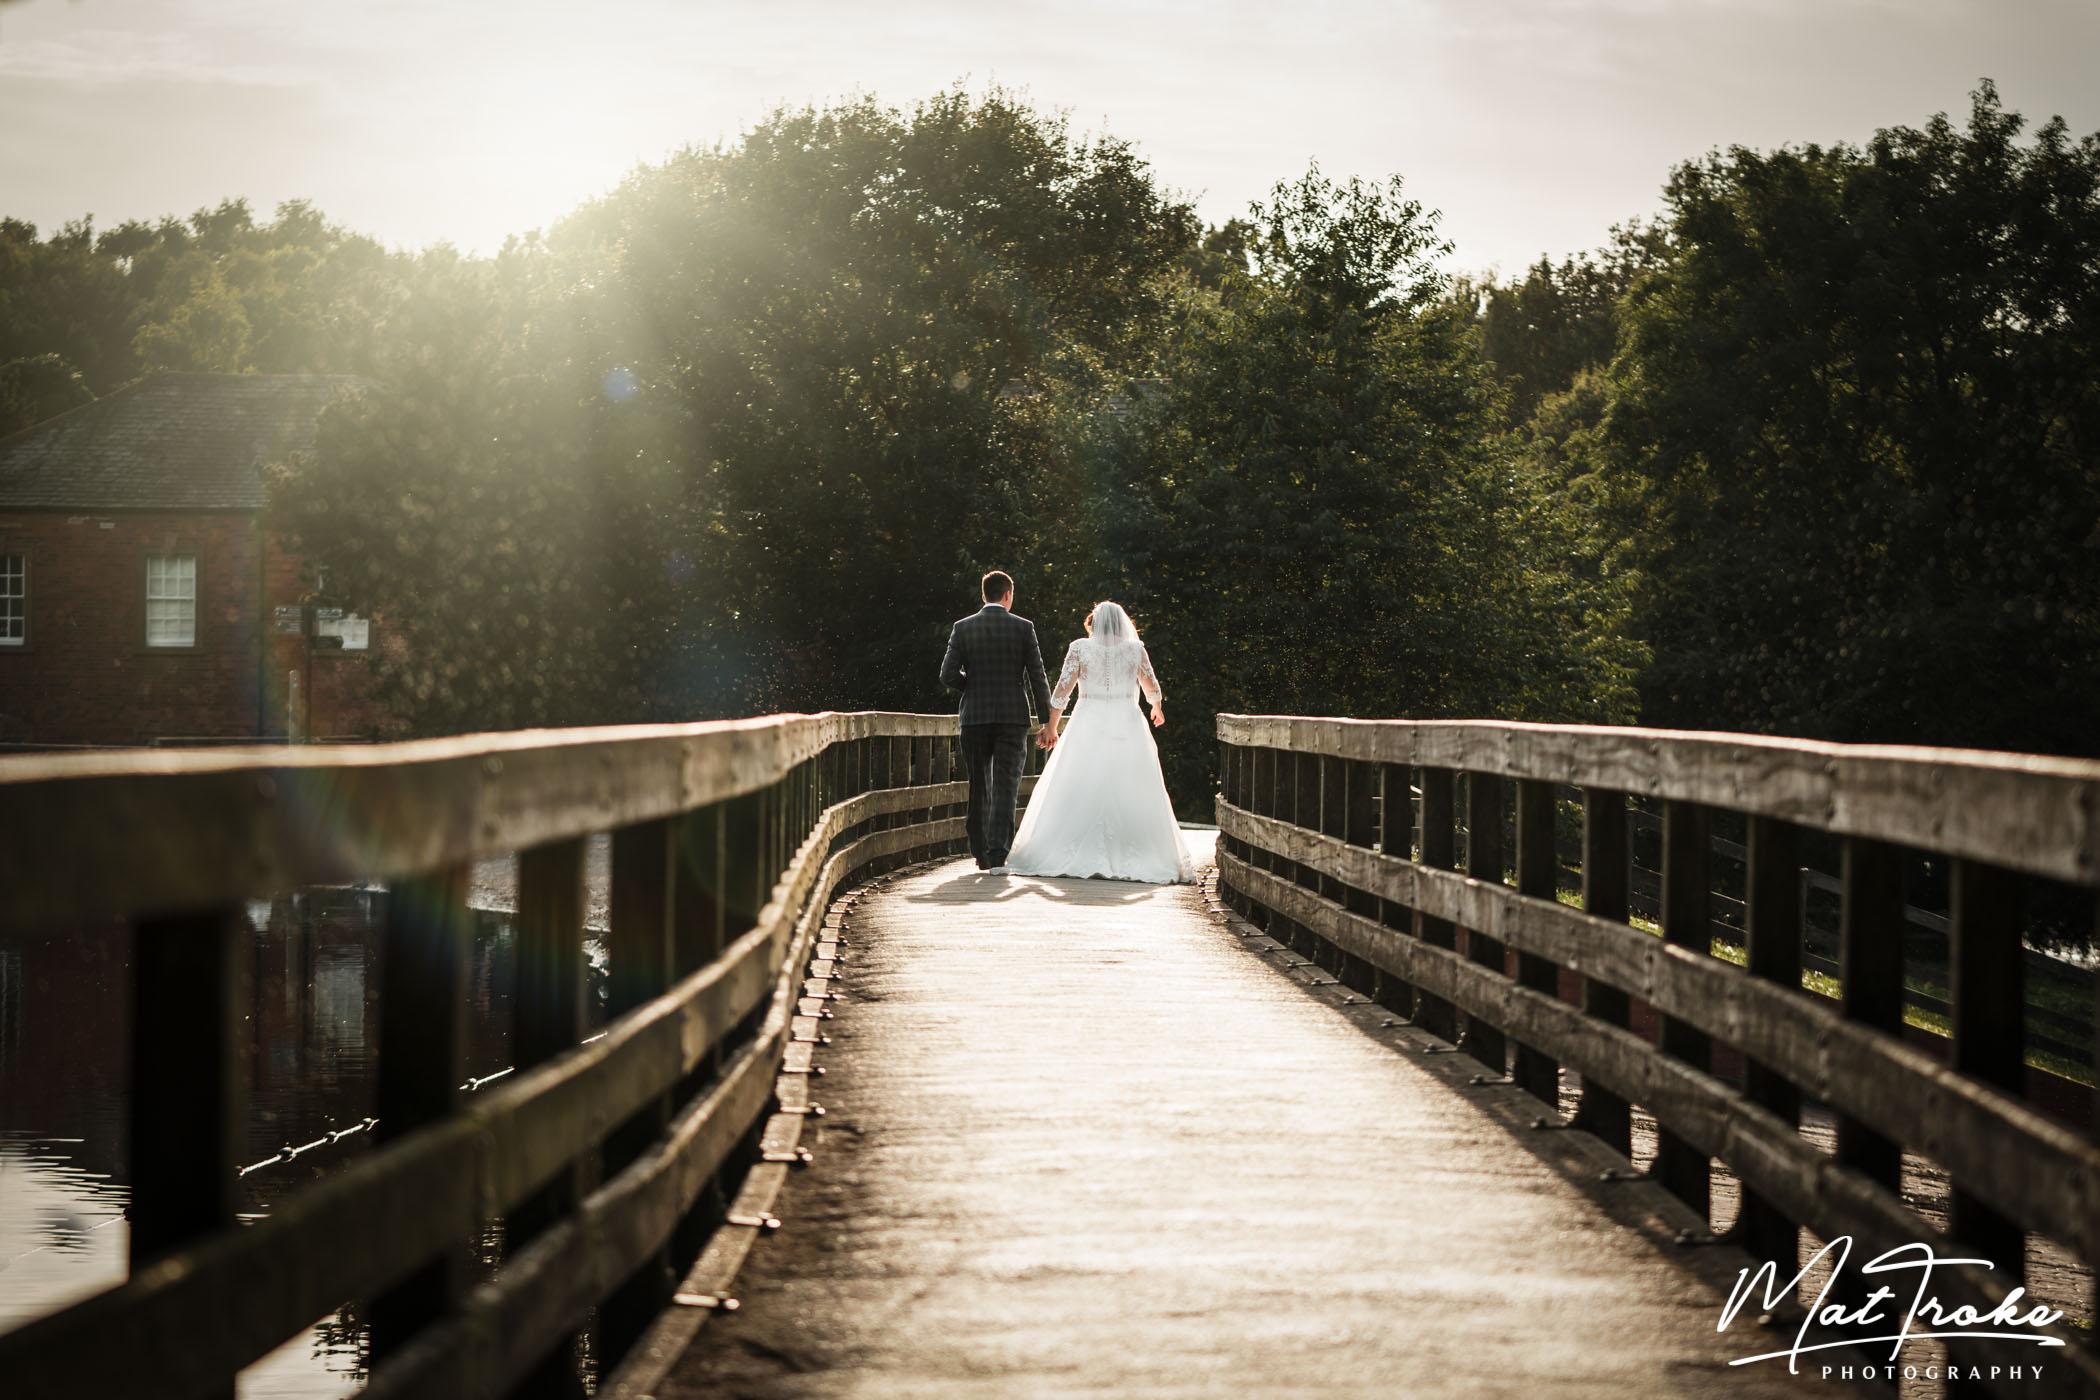 rufford_mill_venue_wedding_photography_beautiful_bride